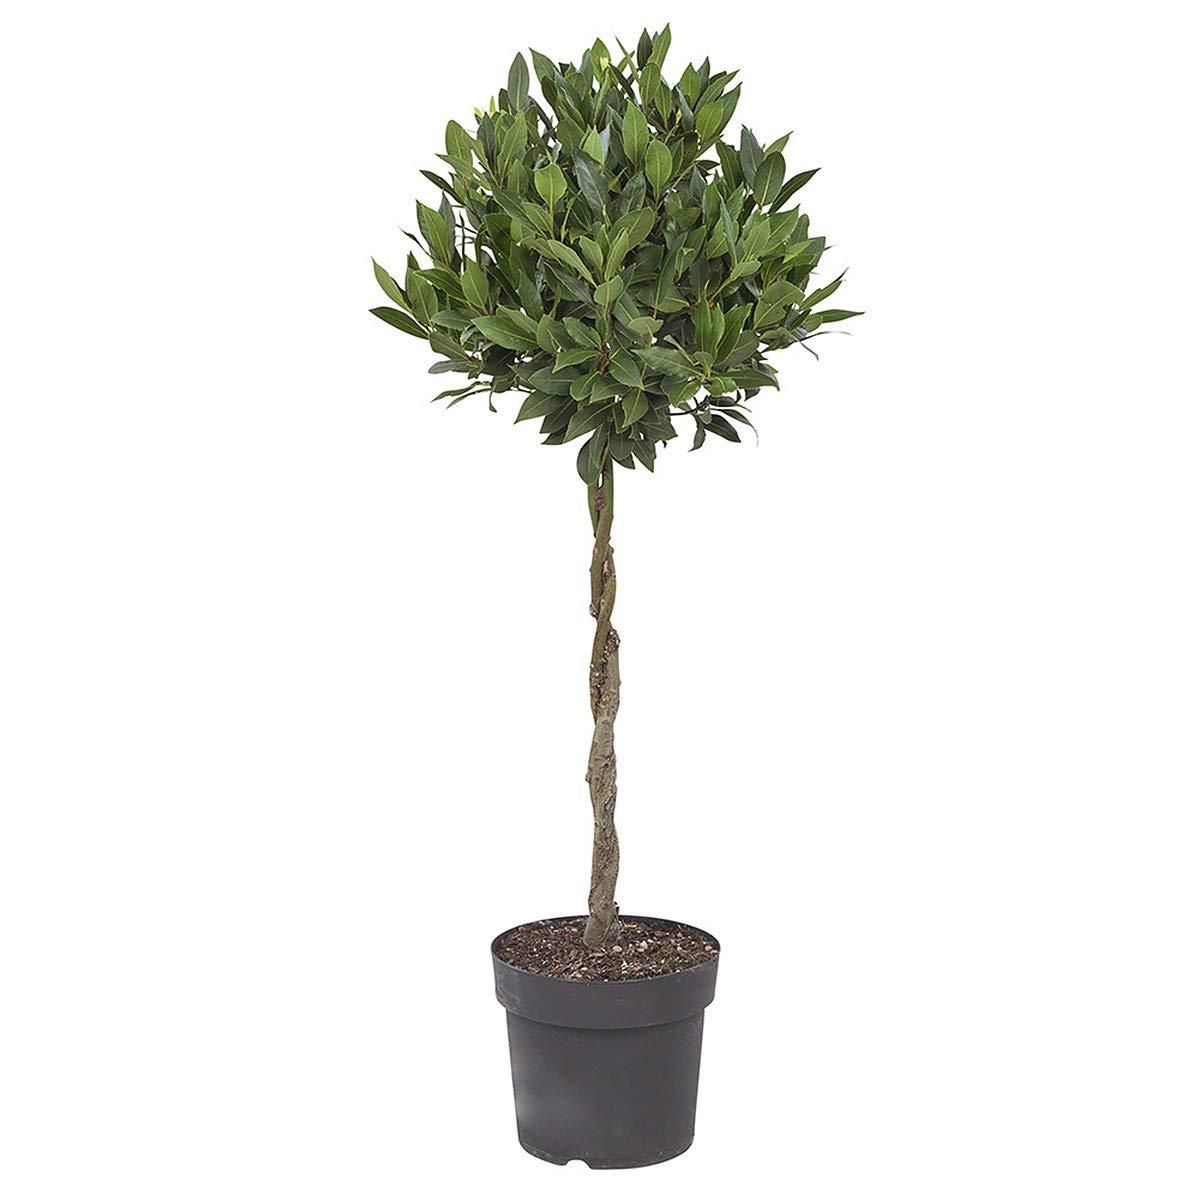 Indoor Plant Height: 100 cm BOTANICLY Laurus Nobilis Bay Leaf